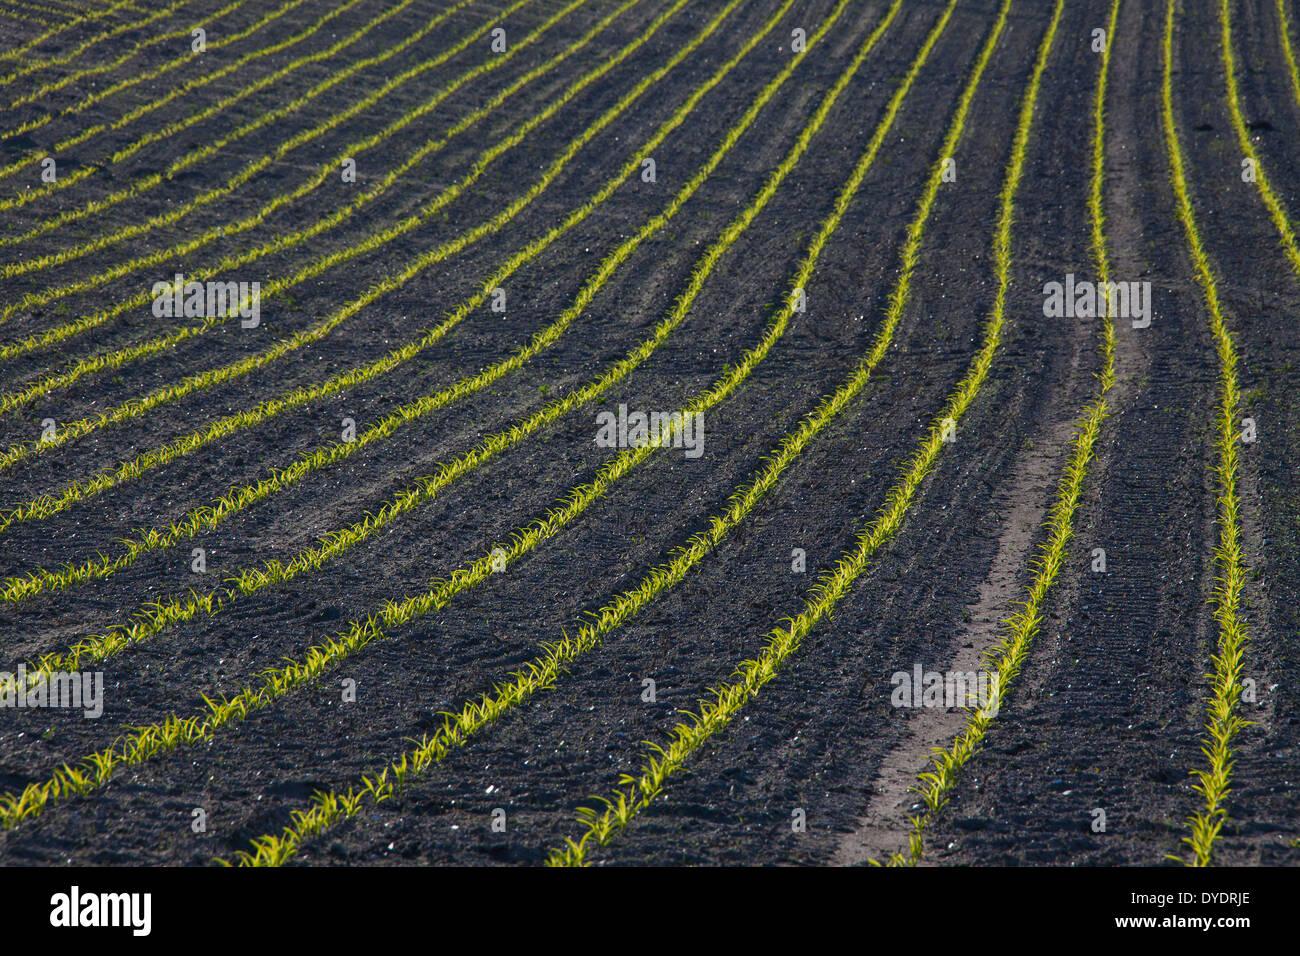 Rows of maize / corn (Zea mays) seedlings growing in field in spring - Stock Image